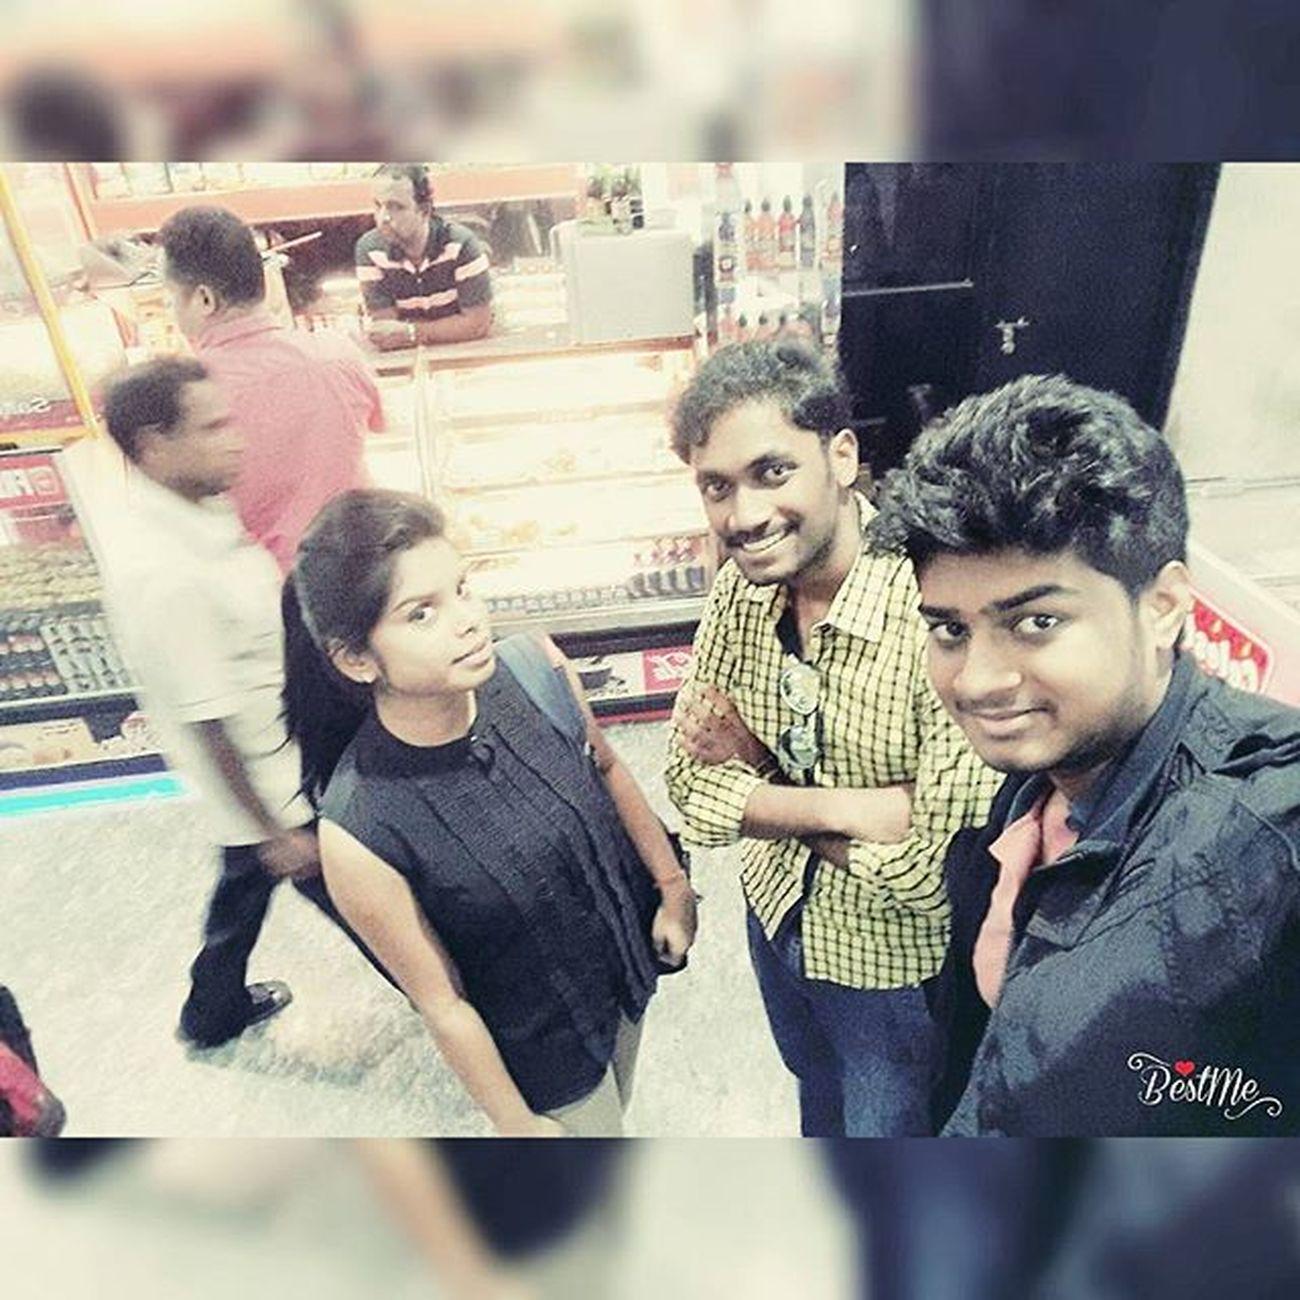 ●|| That awesum moment when you unexpectedly meet your 10th se 11th hone ke mele main bichde hue Friends :) ||● Smruti Nandi x'D Har_ek_frnd_kamina_hota_hai :p Bhubneshwar Much_fun